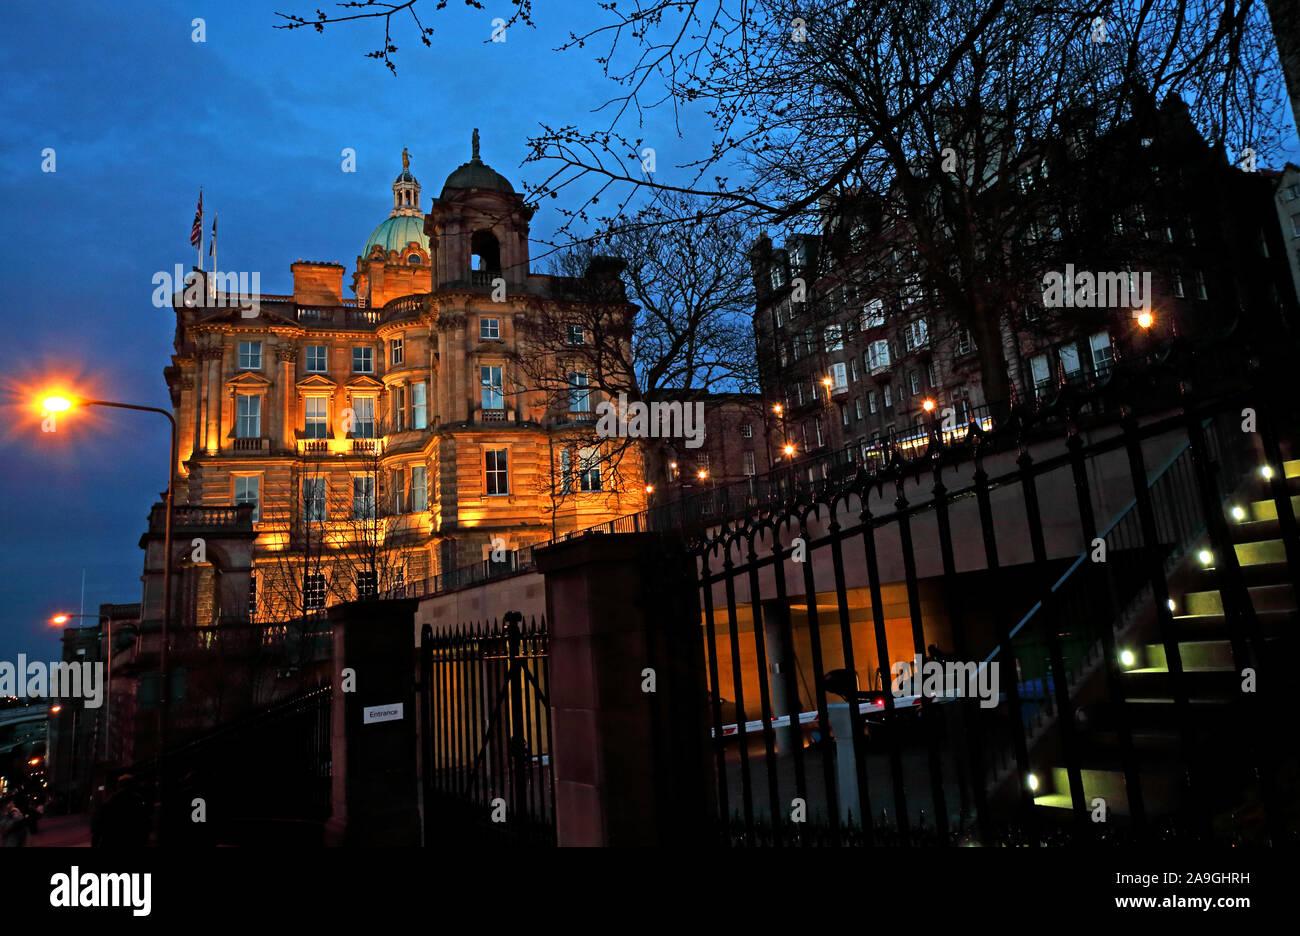 HotpixUK,@HotpixUK,GoTonySmith,UK,Scotland,at night,night,dusk,at dusk,EH1,on,Edinburgh,EH1 1YZ,architecture,Head Office,Bank of Scotland PLC,HBOS,Lloyds TSB